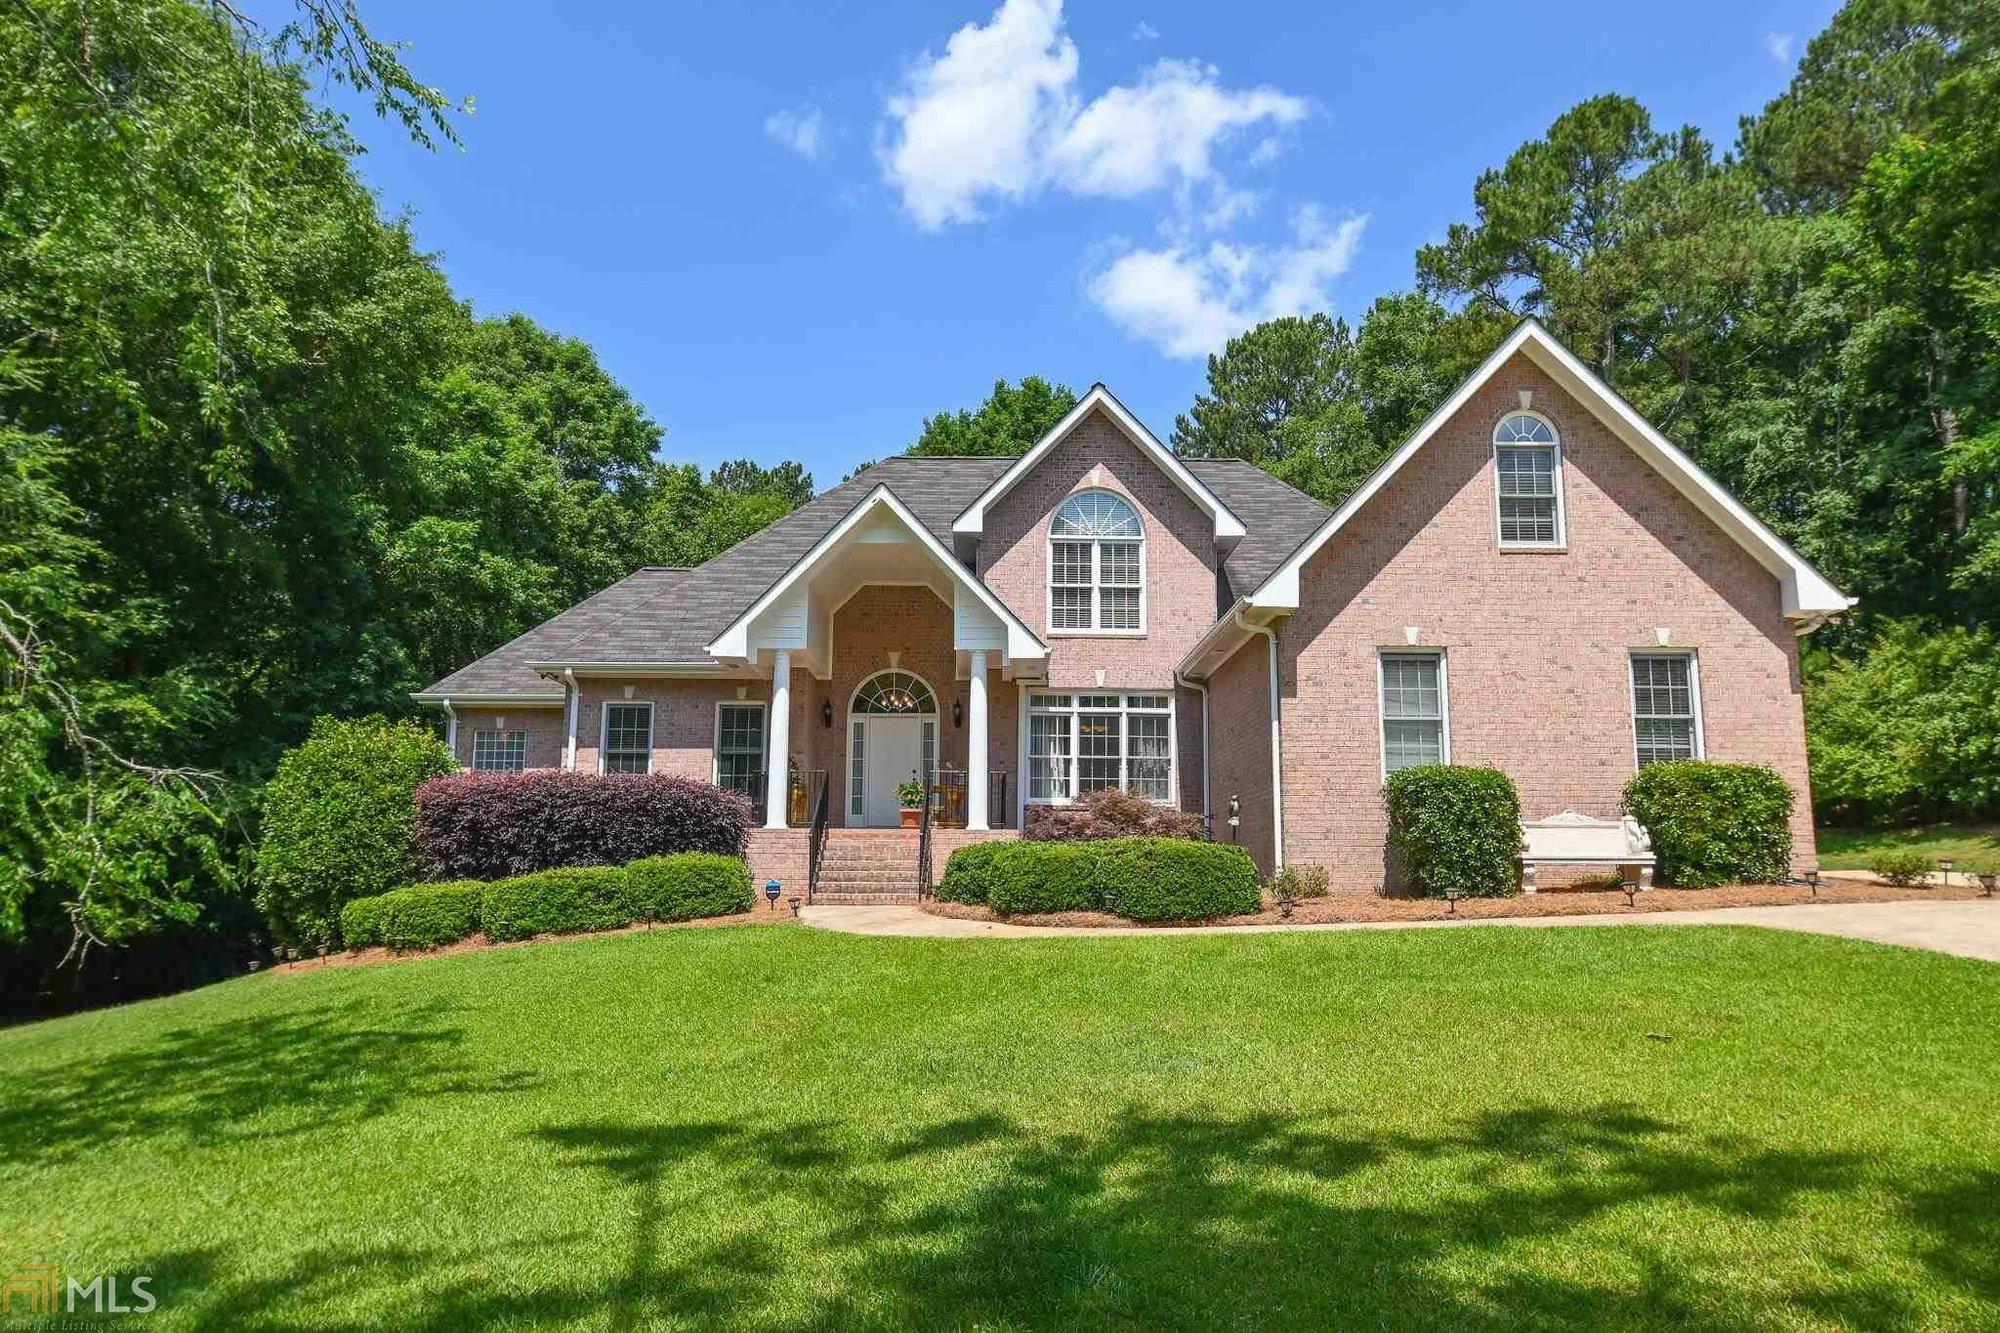 House in Watkinsville, Georgia, United States 1